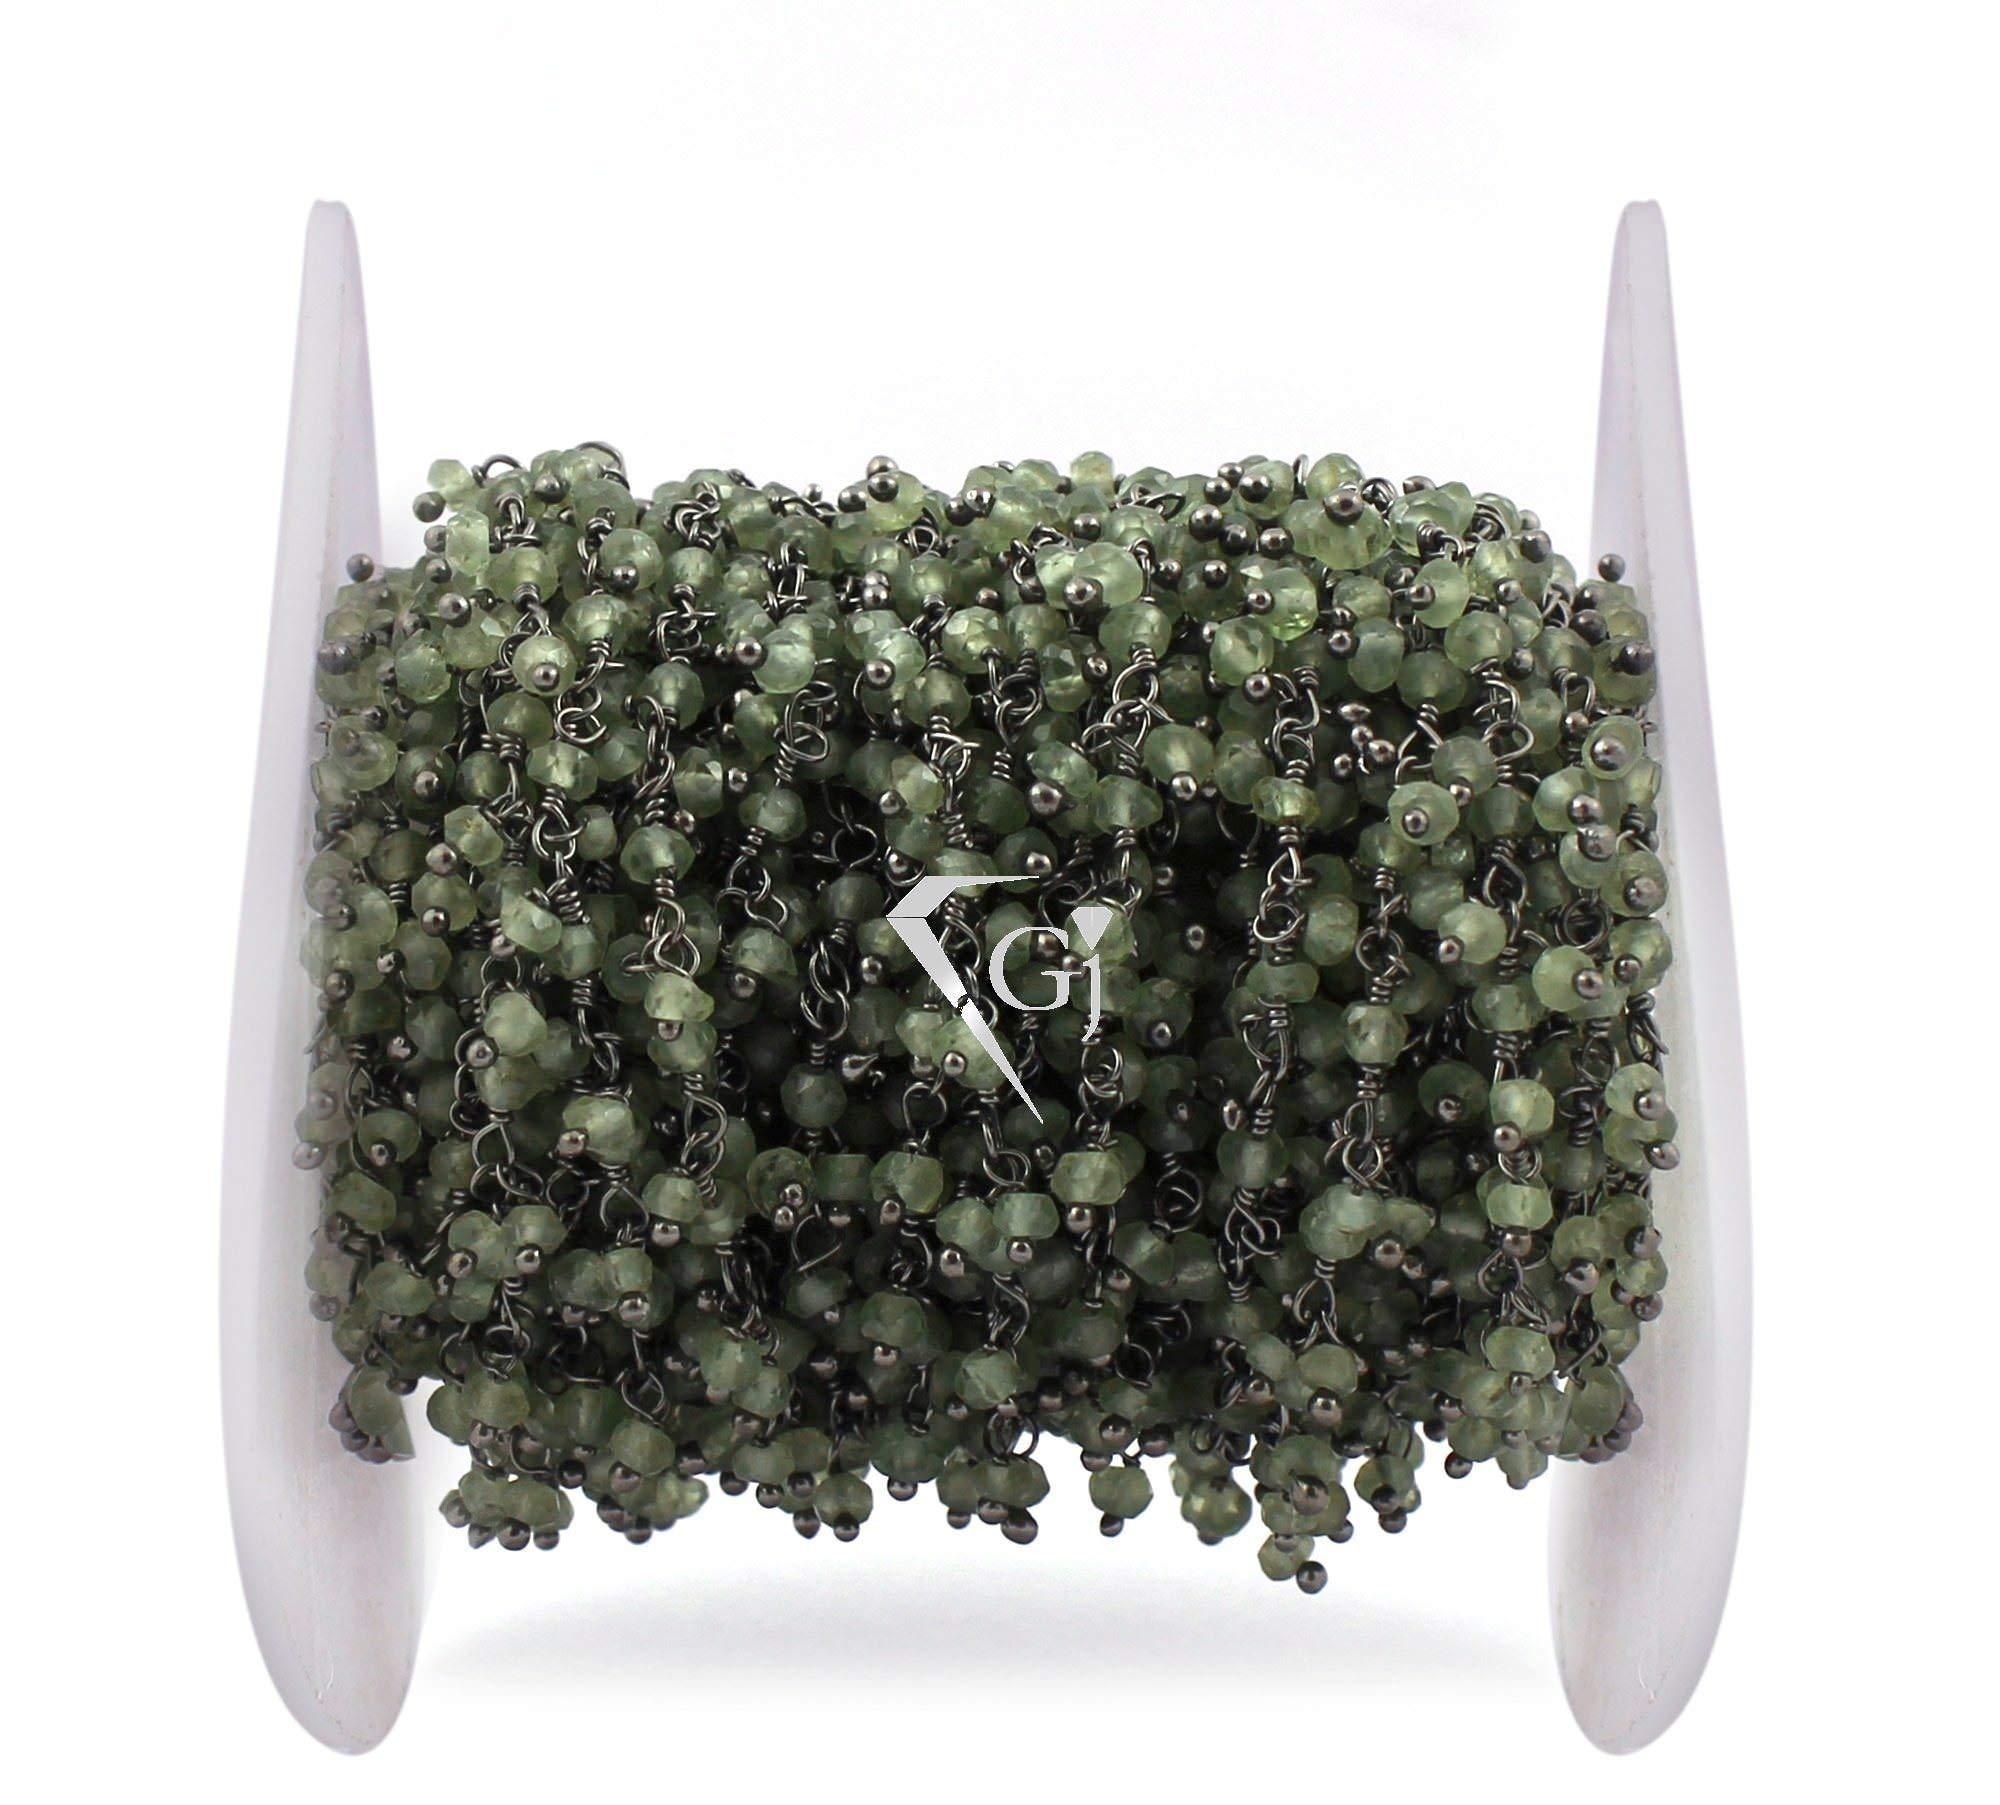 15 Feet Peridot Gemstone Cluster Chain, Dangle Beads Chain, Gemstone Rosary Chain, Wire Wrapped Beads Chain, Black Plated Link Chain by LadoNarayani